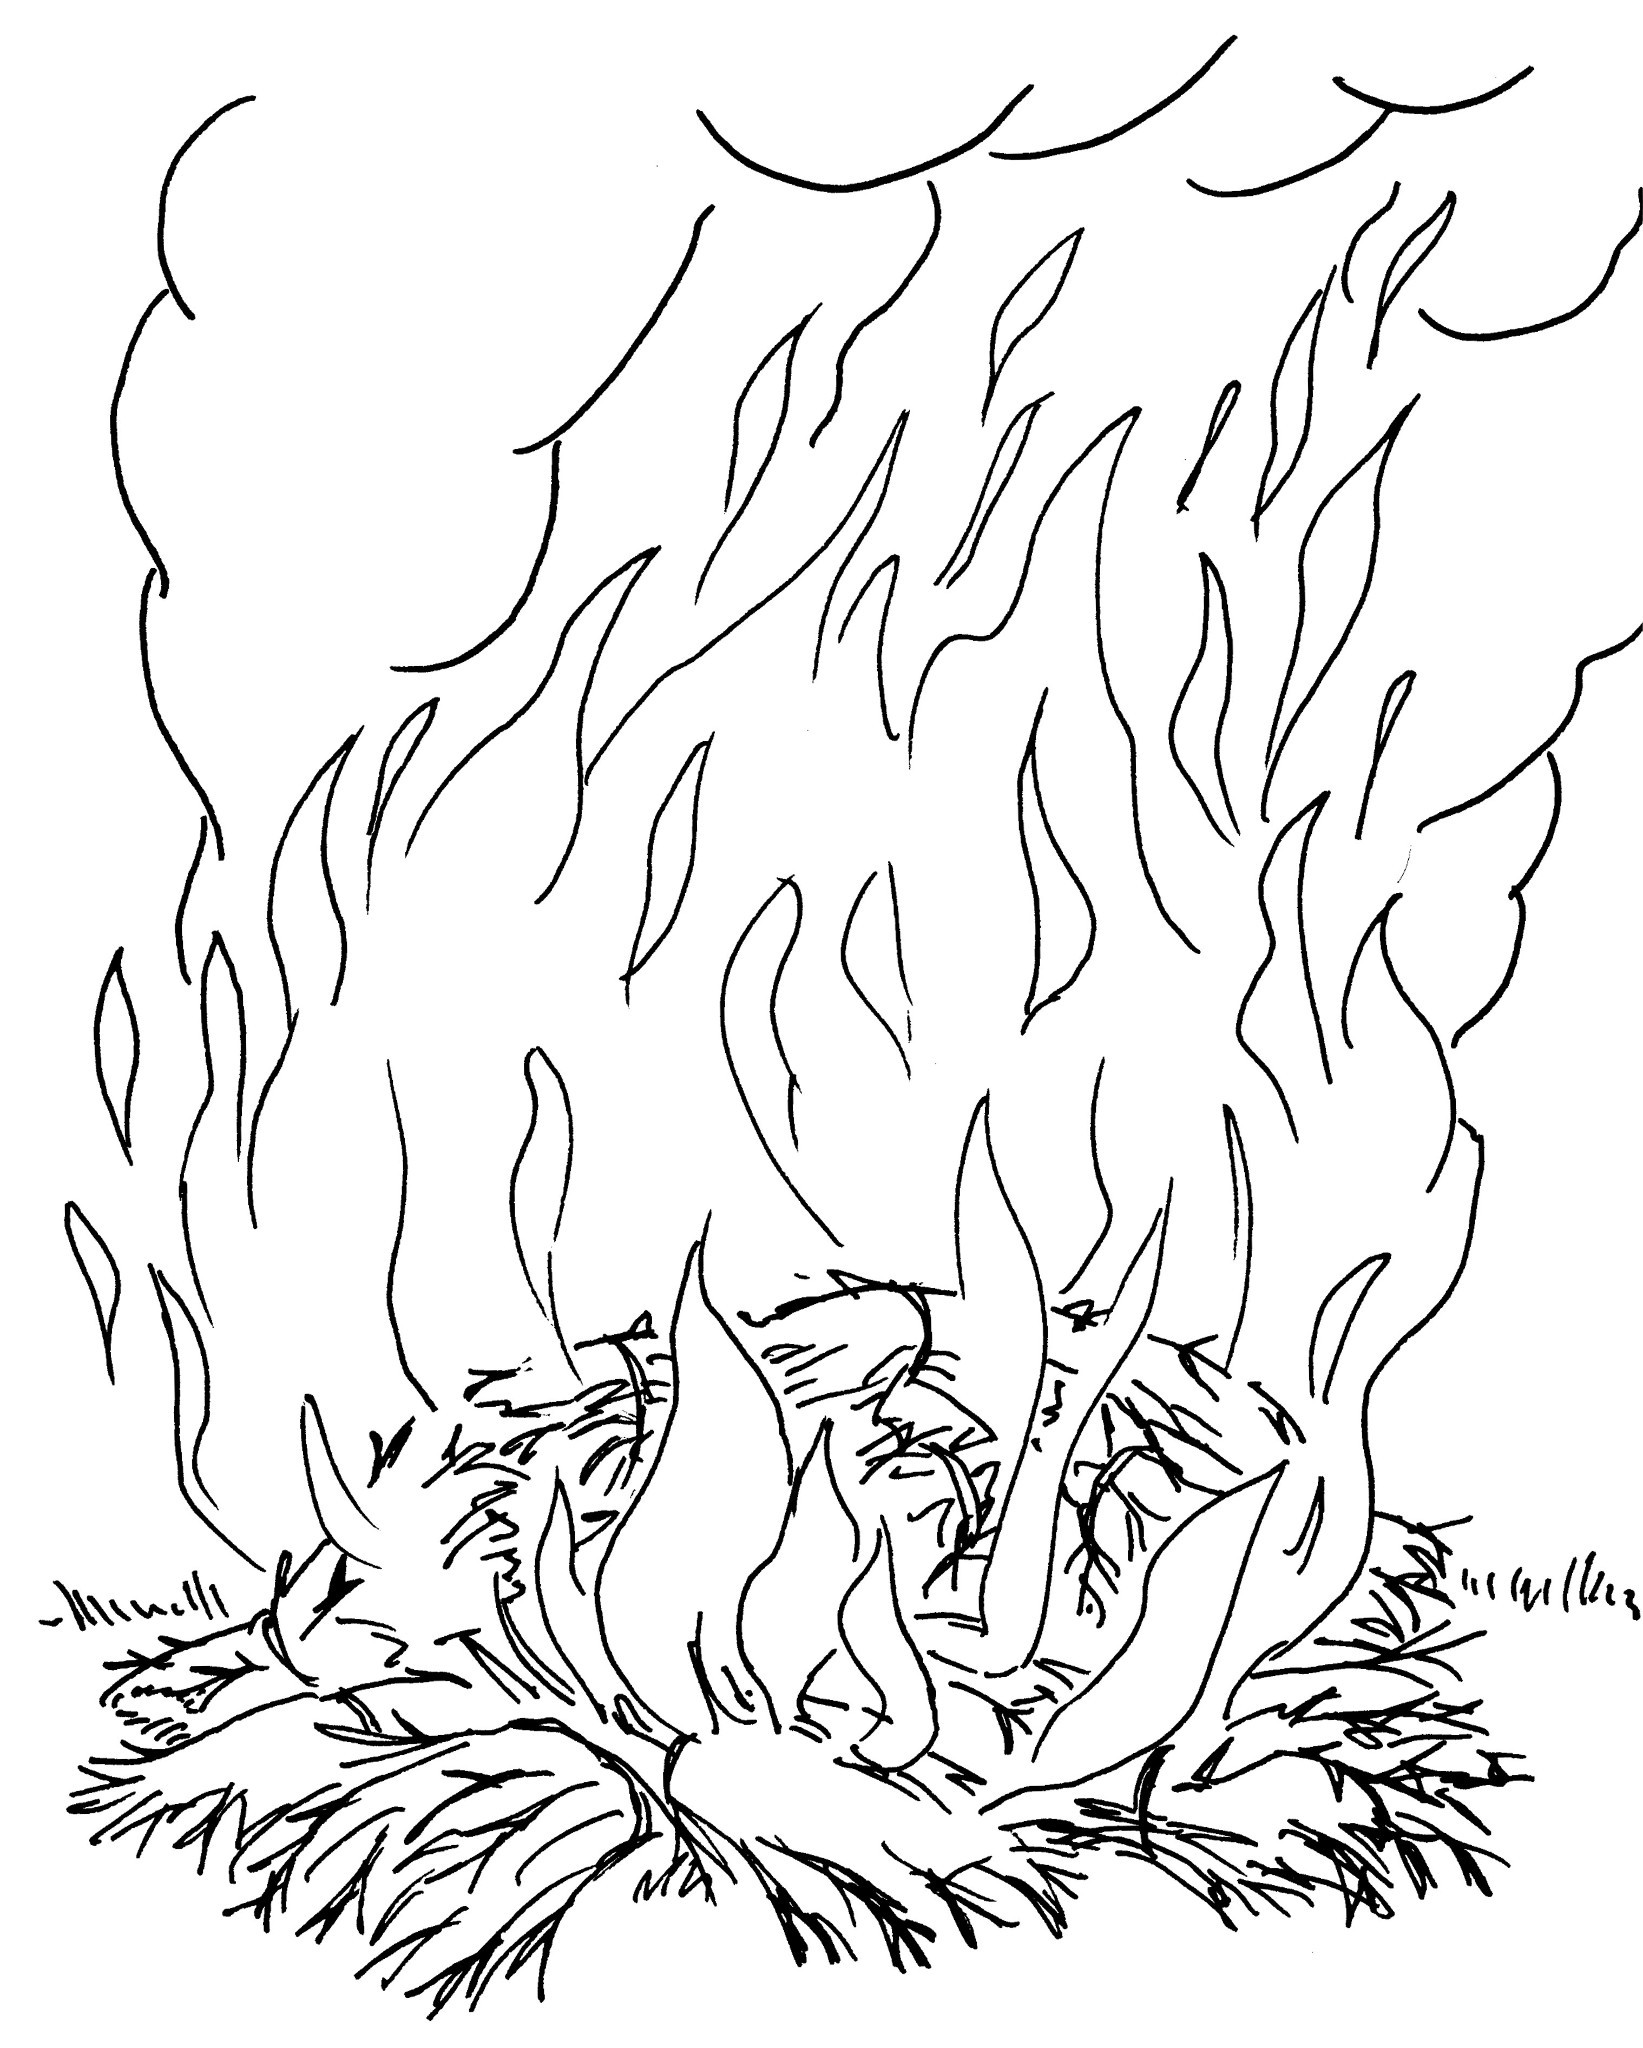 17 dessins de coloriage oiseau de feu imprimer - Coloriage pokemon feu ...